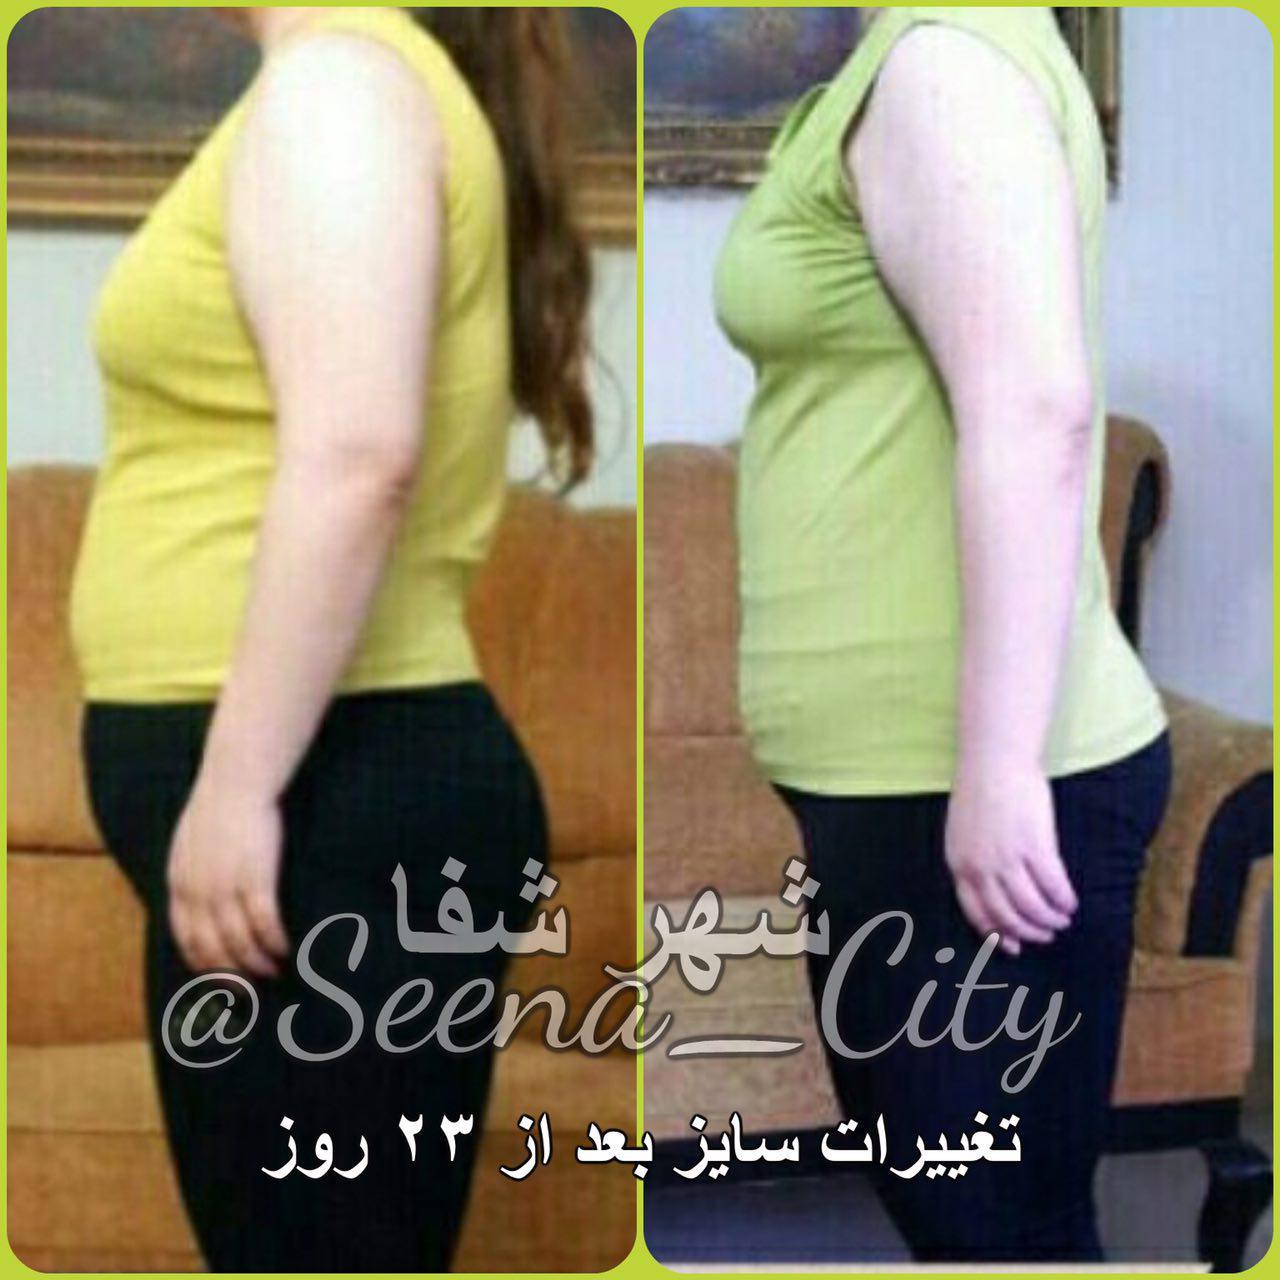 لاغری آسان کاهش وزن گیاهی دمنوش